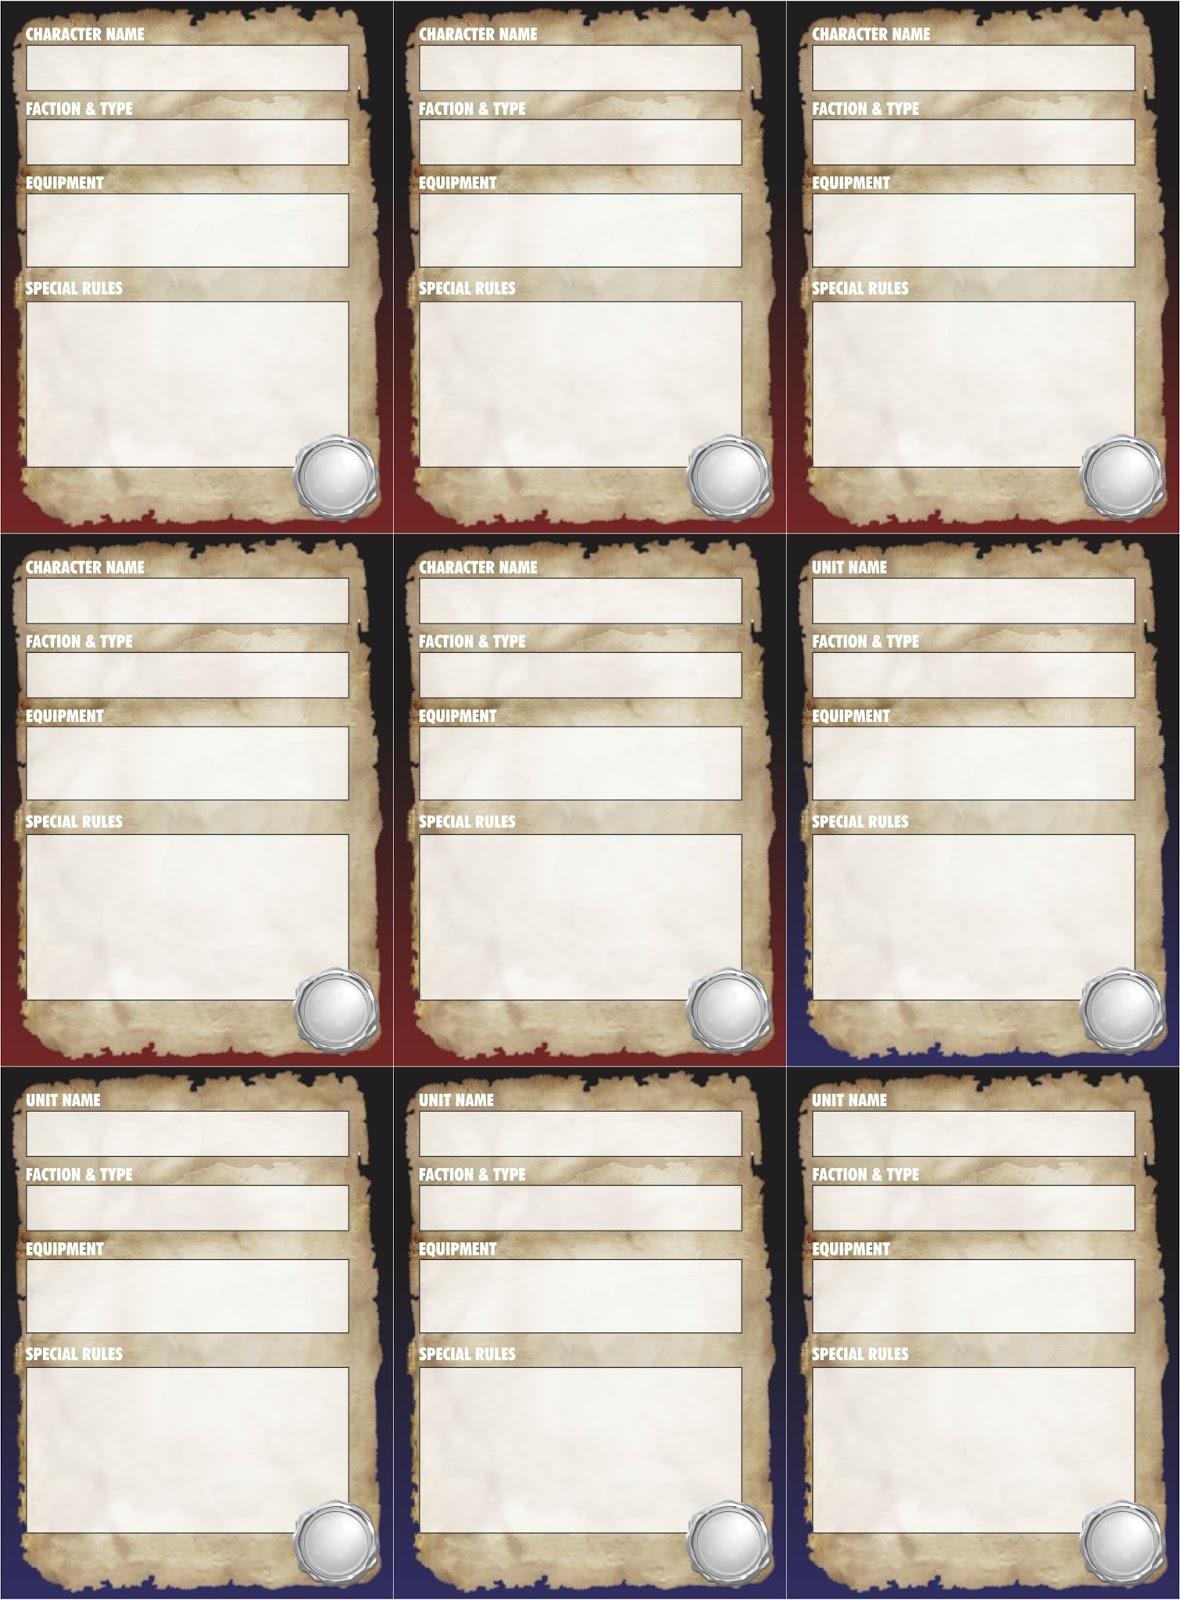 league event card